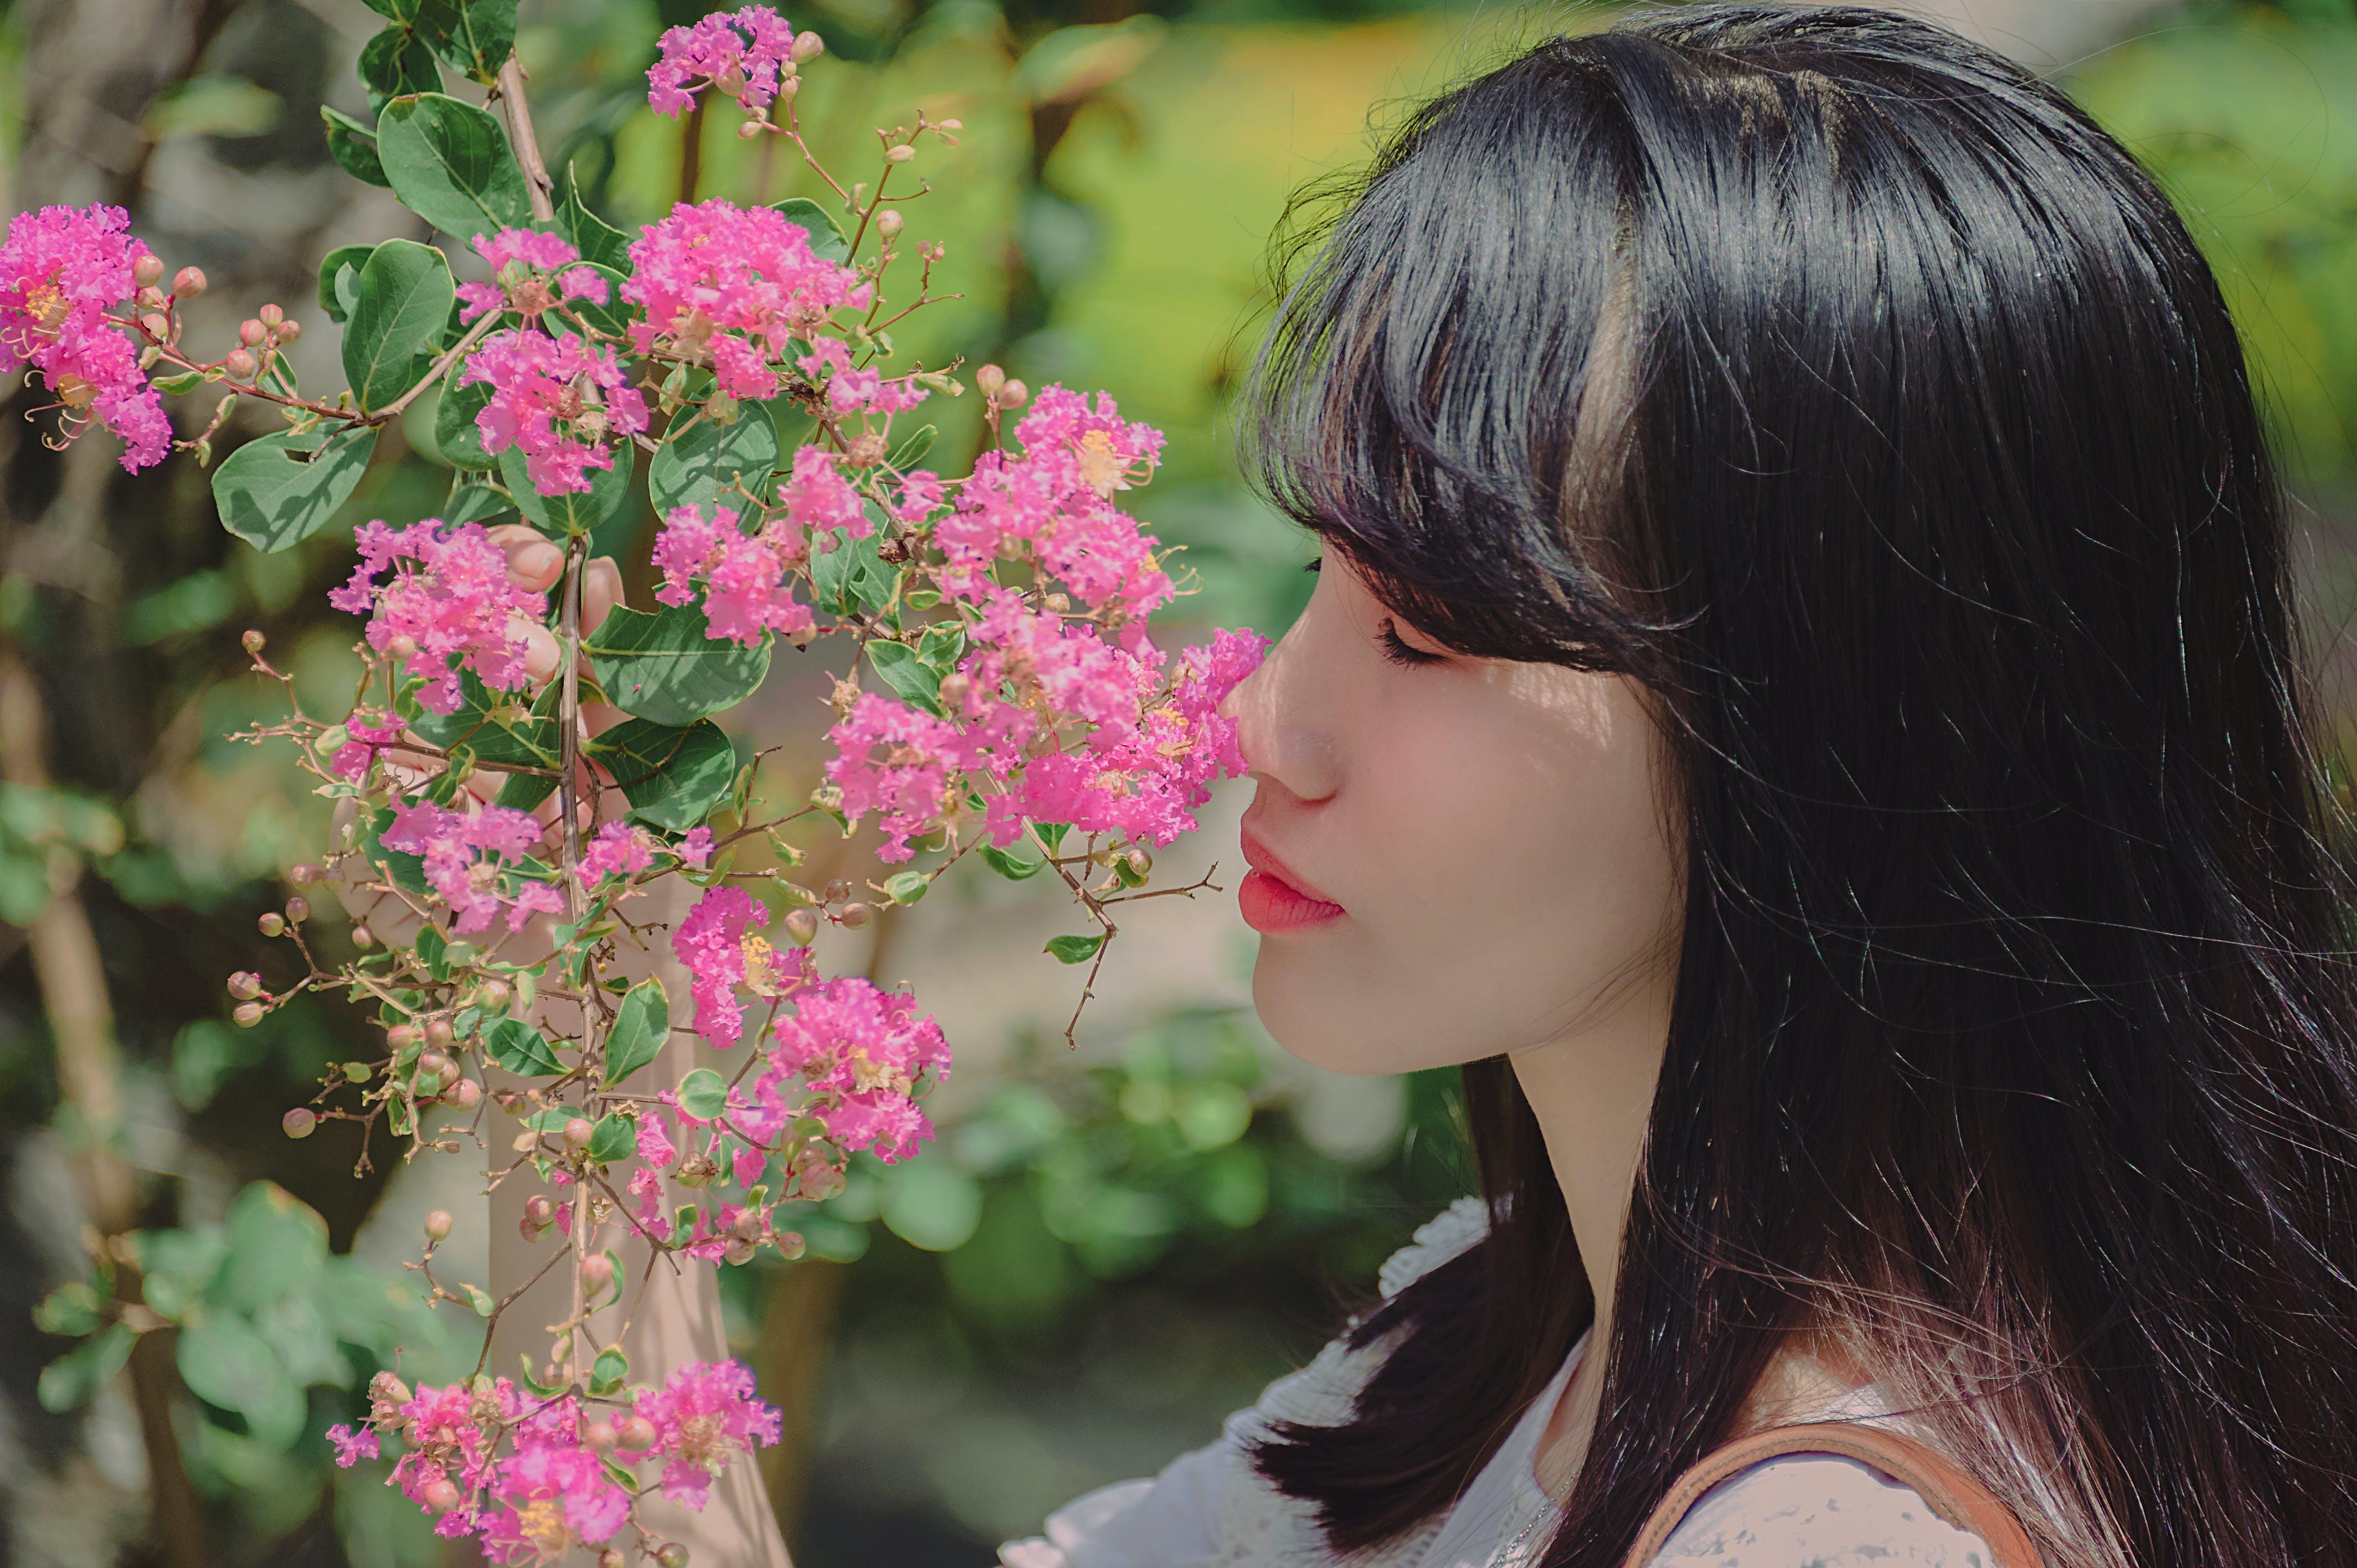 Woman Holding Pink Petal Flowers